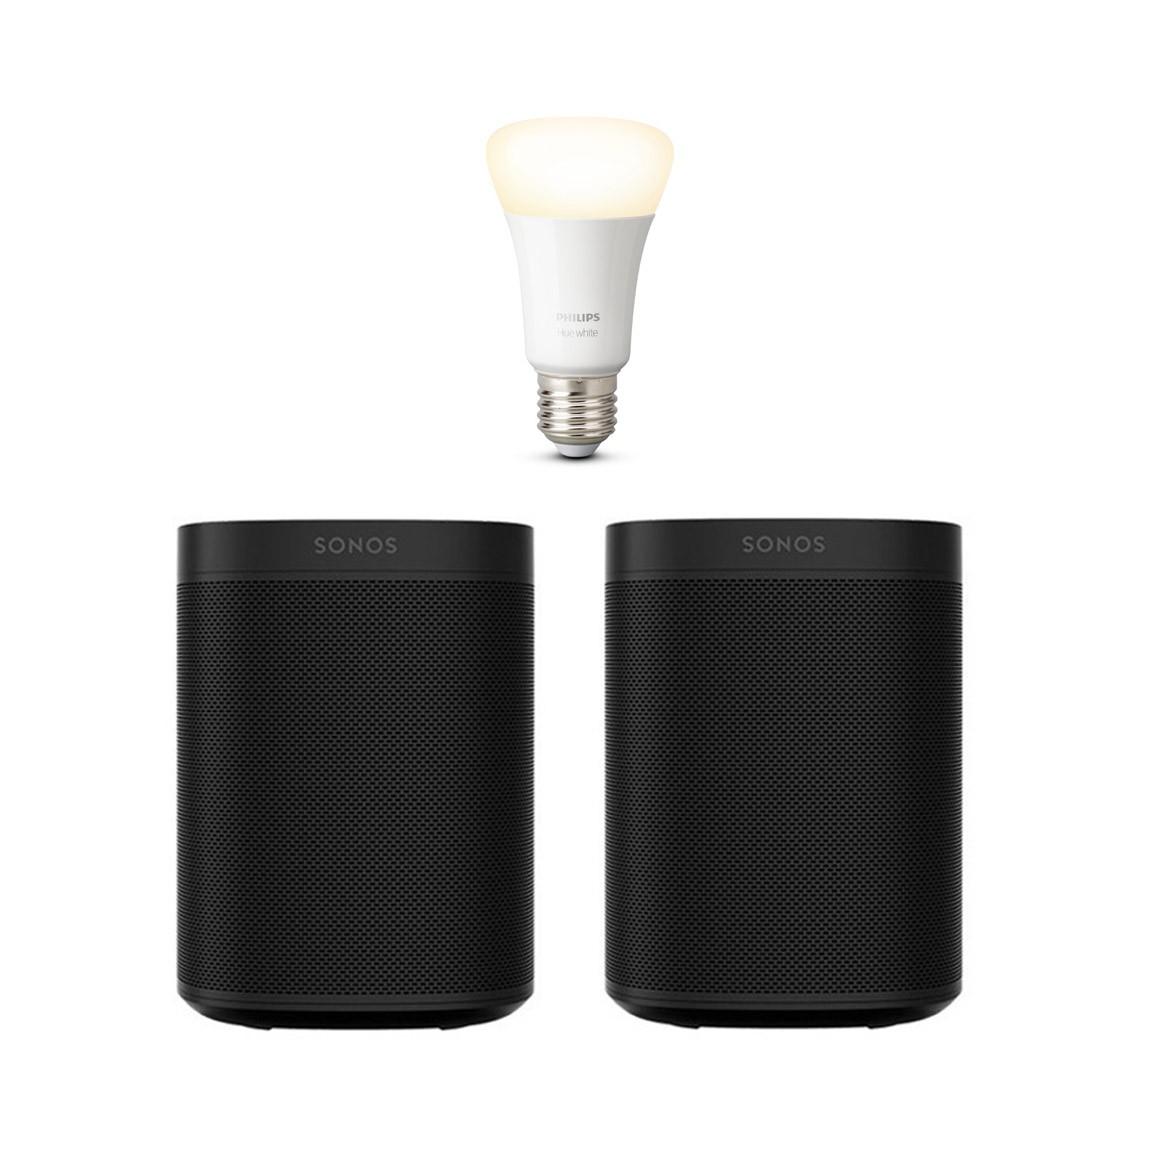 Sonos Bundles: SONOS ONE SL + Philips Hue White Bluetooth Smart Bulb A19 for $258 & Many More